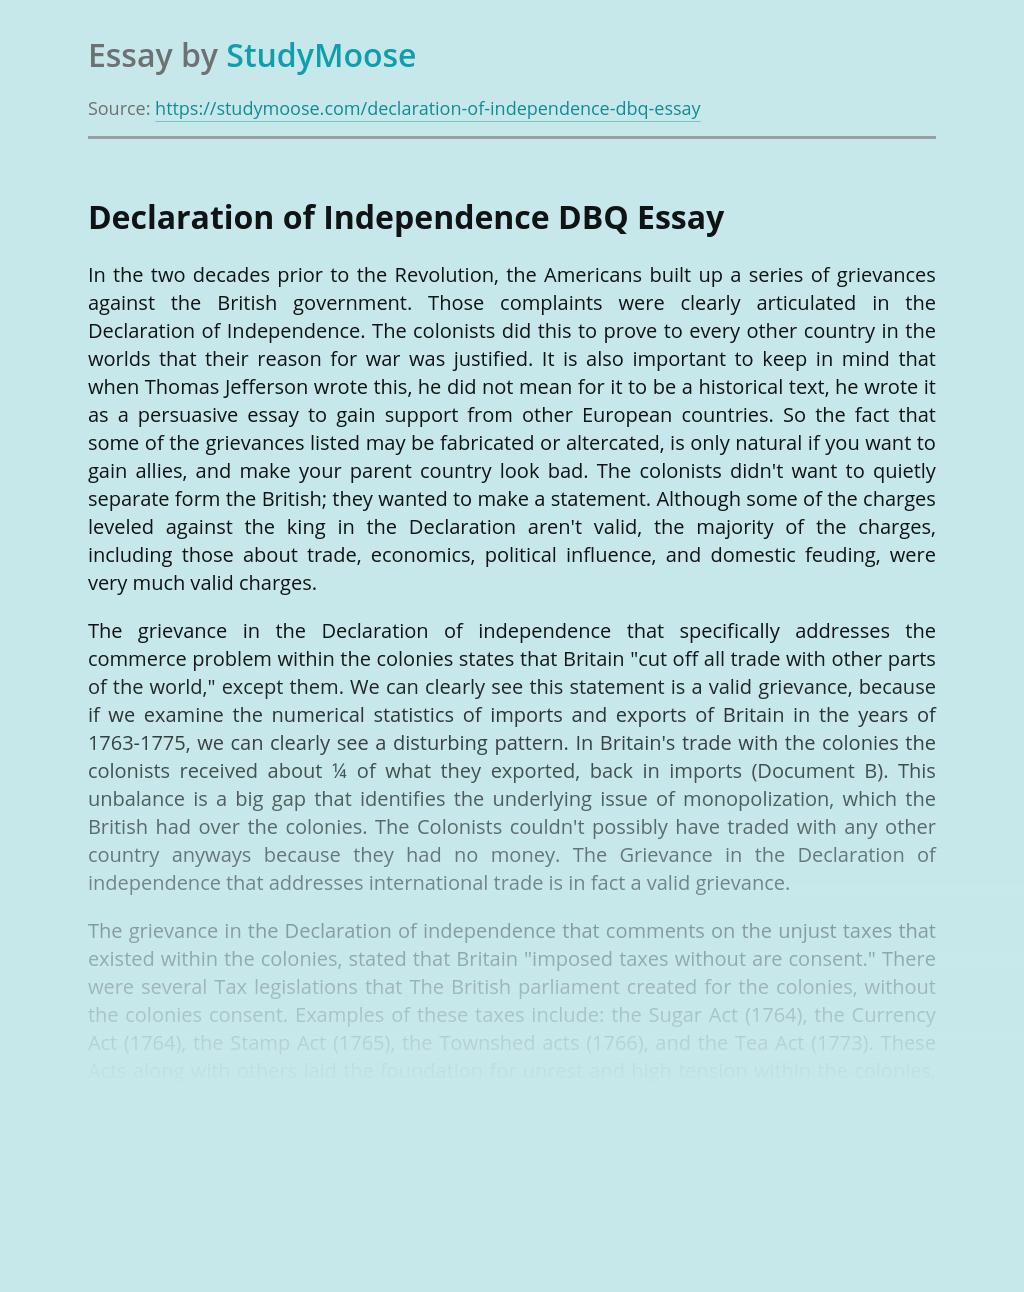 Declaration of Independence DBQ